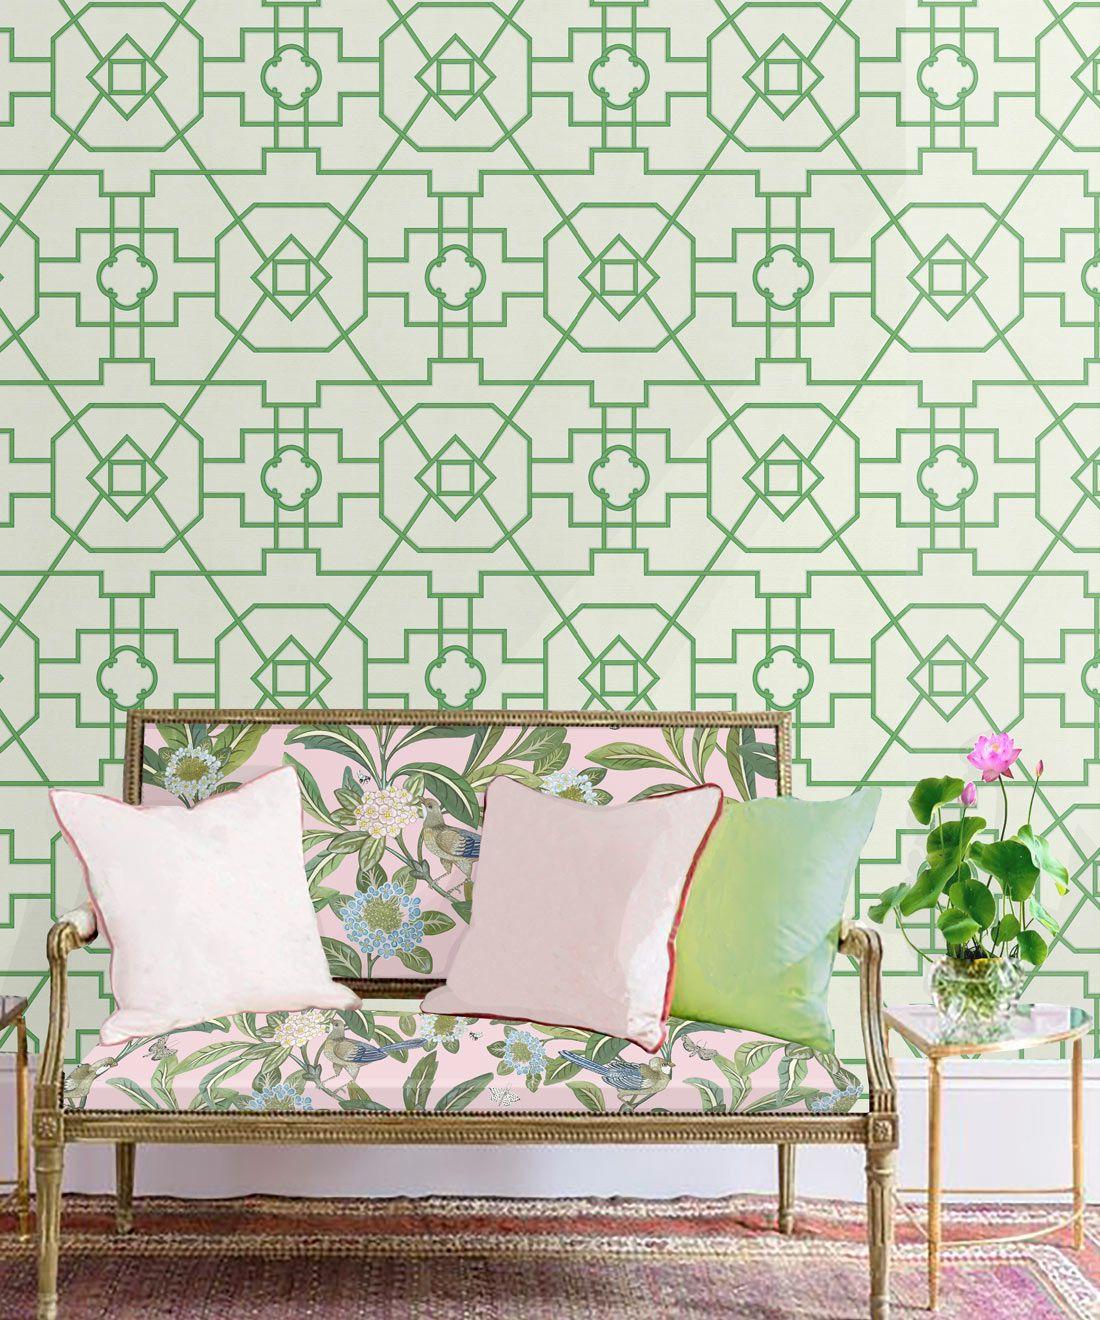 Trellis Wallpaper • Geometric Wallpaper • Ivory Wallpaper • Insitu